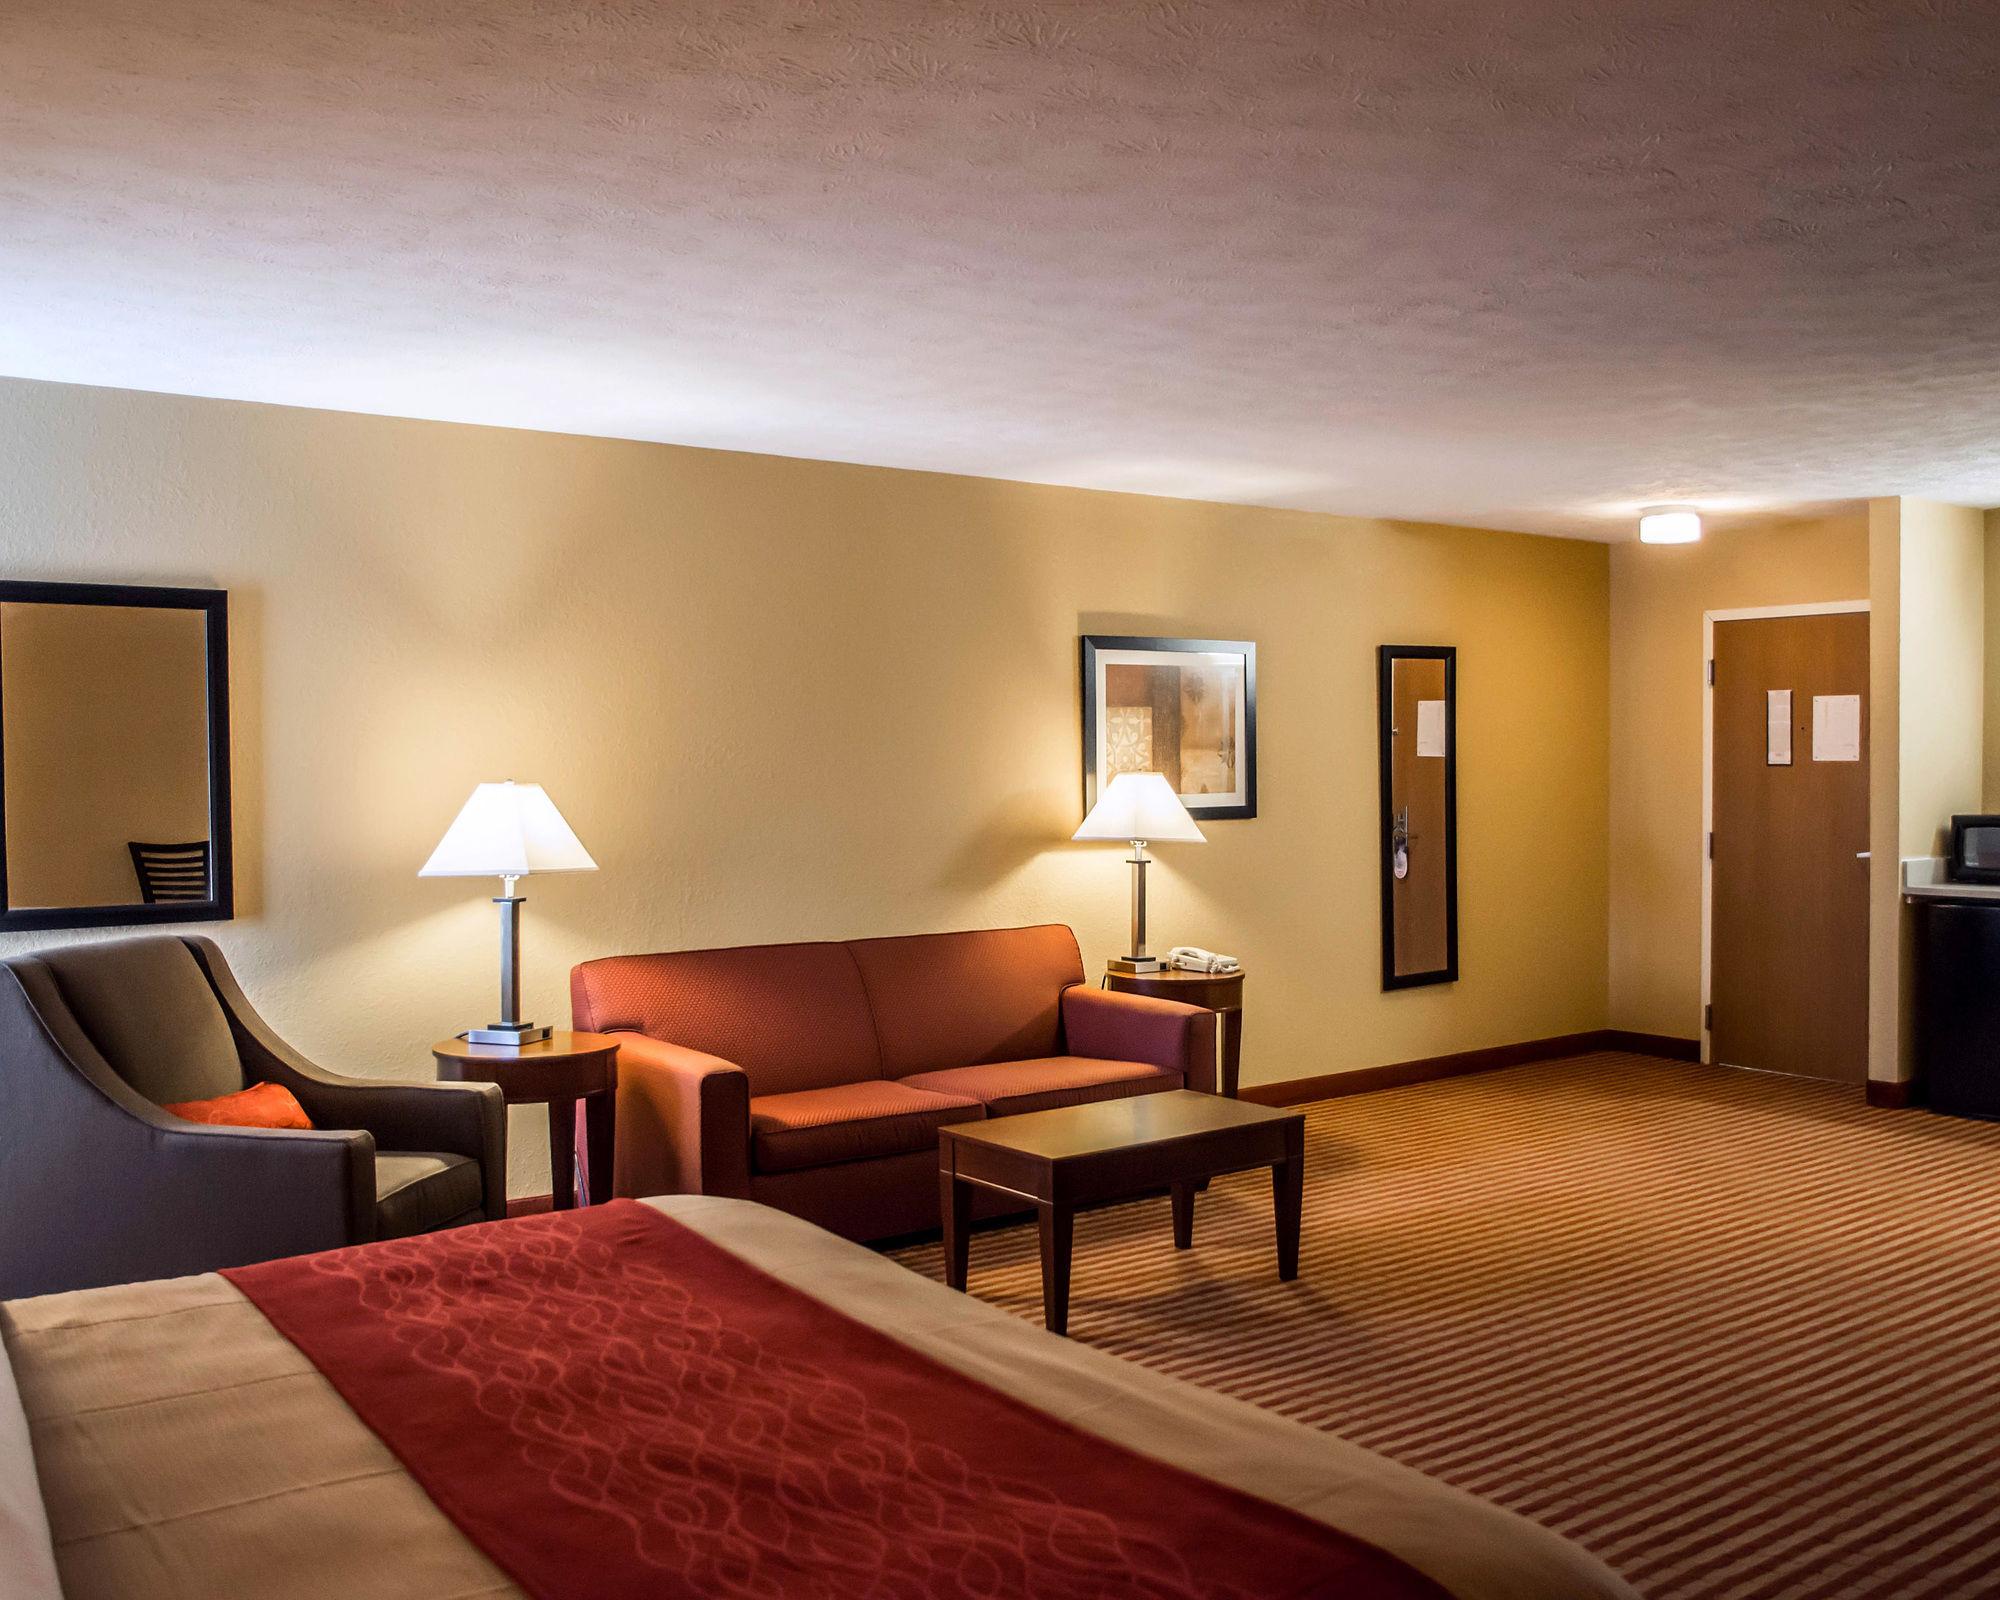 Cincinnati Hotel Coupons for Cincinnati, Ohio - FreeHotelCoupons.com